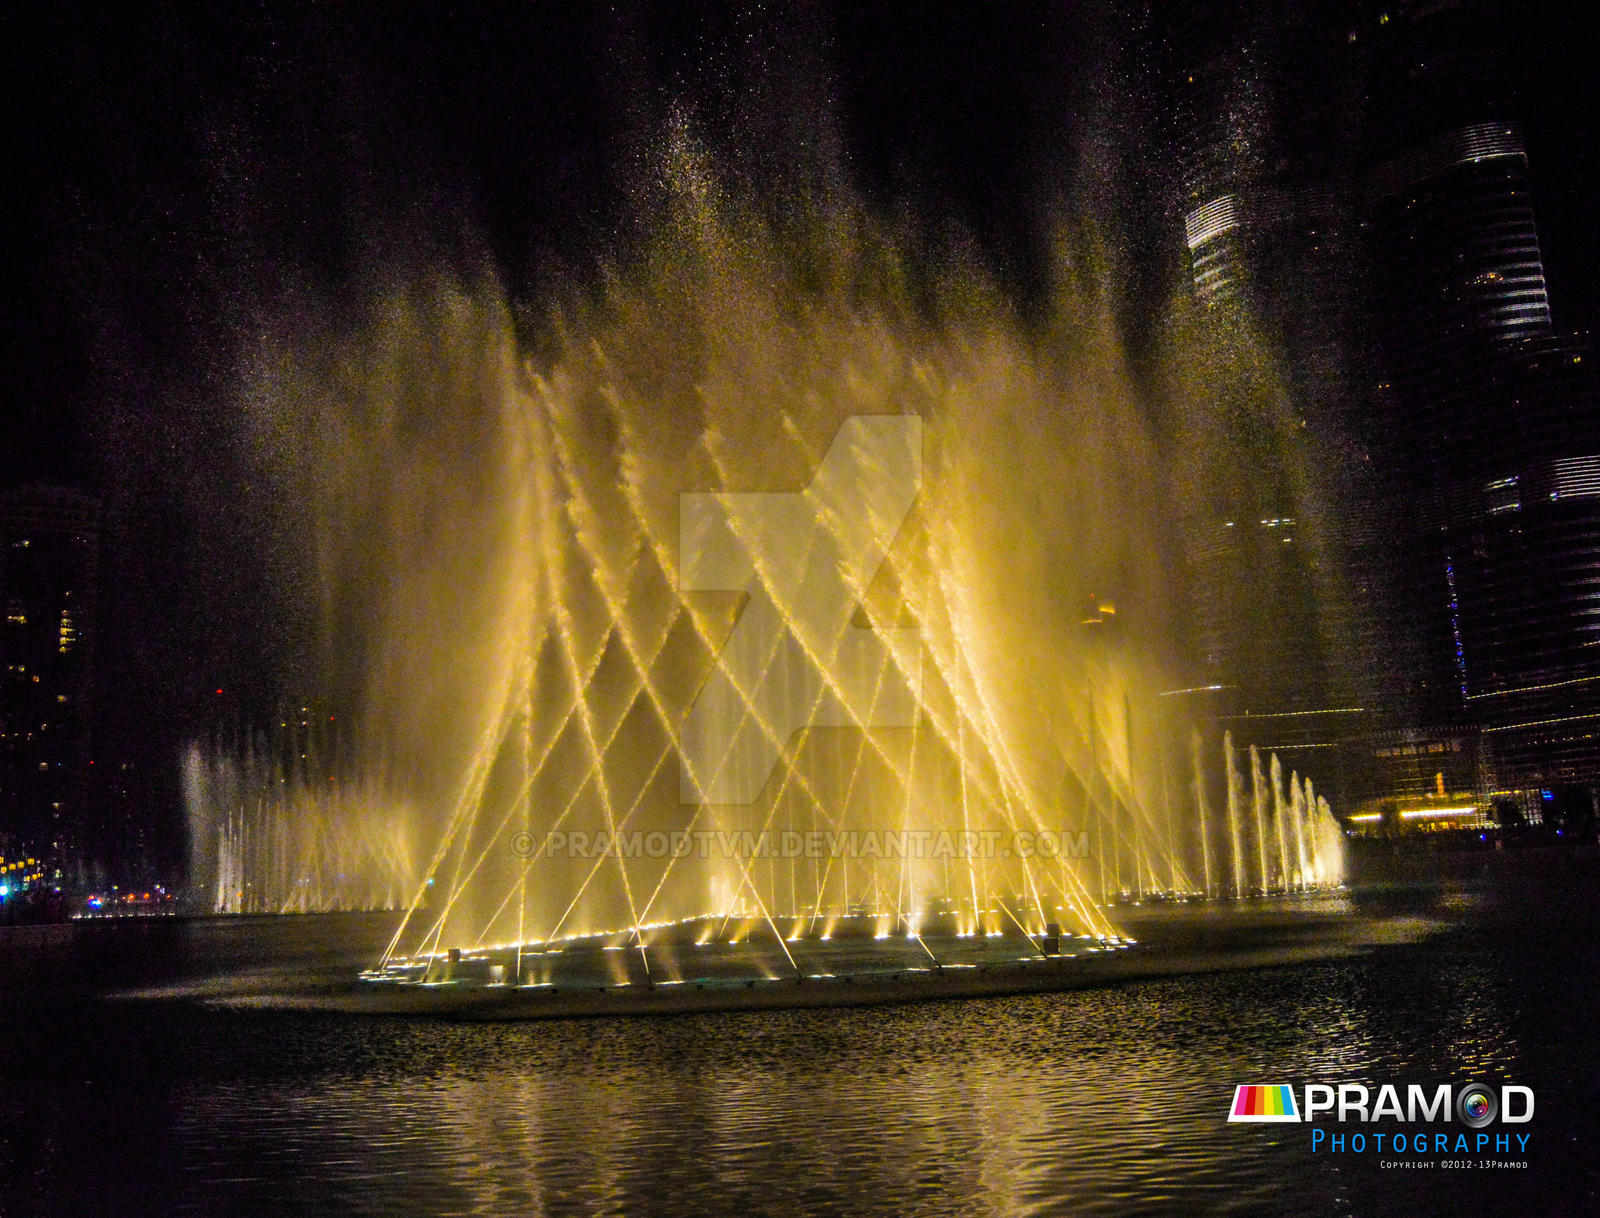 Fountain by pramodtvm